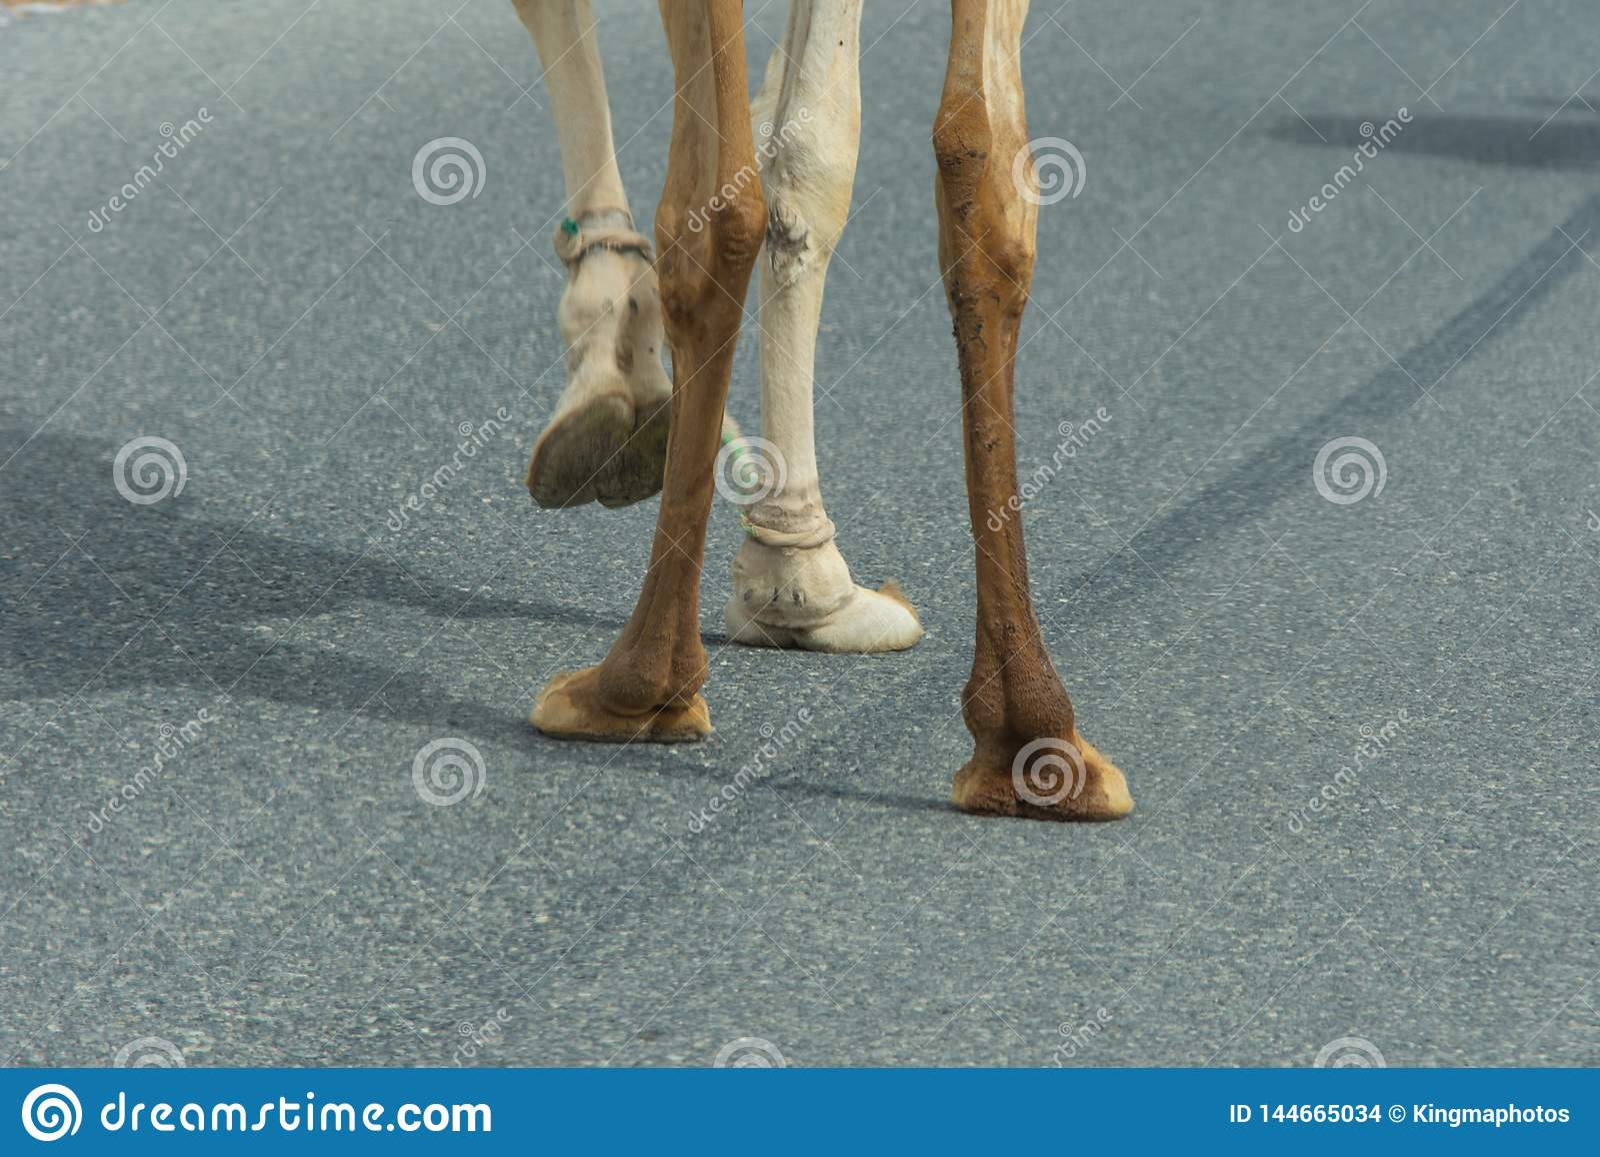 Camel feet close-up as it crosses the street in Ras al Khaimah, United Arab Emirates